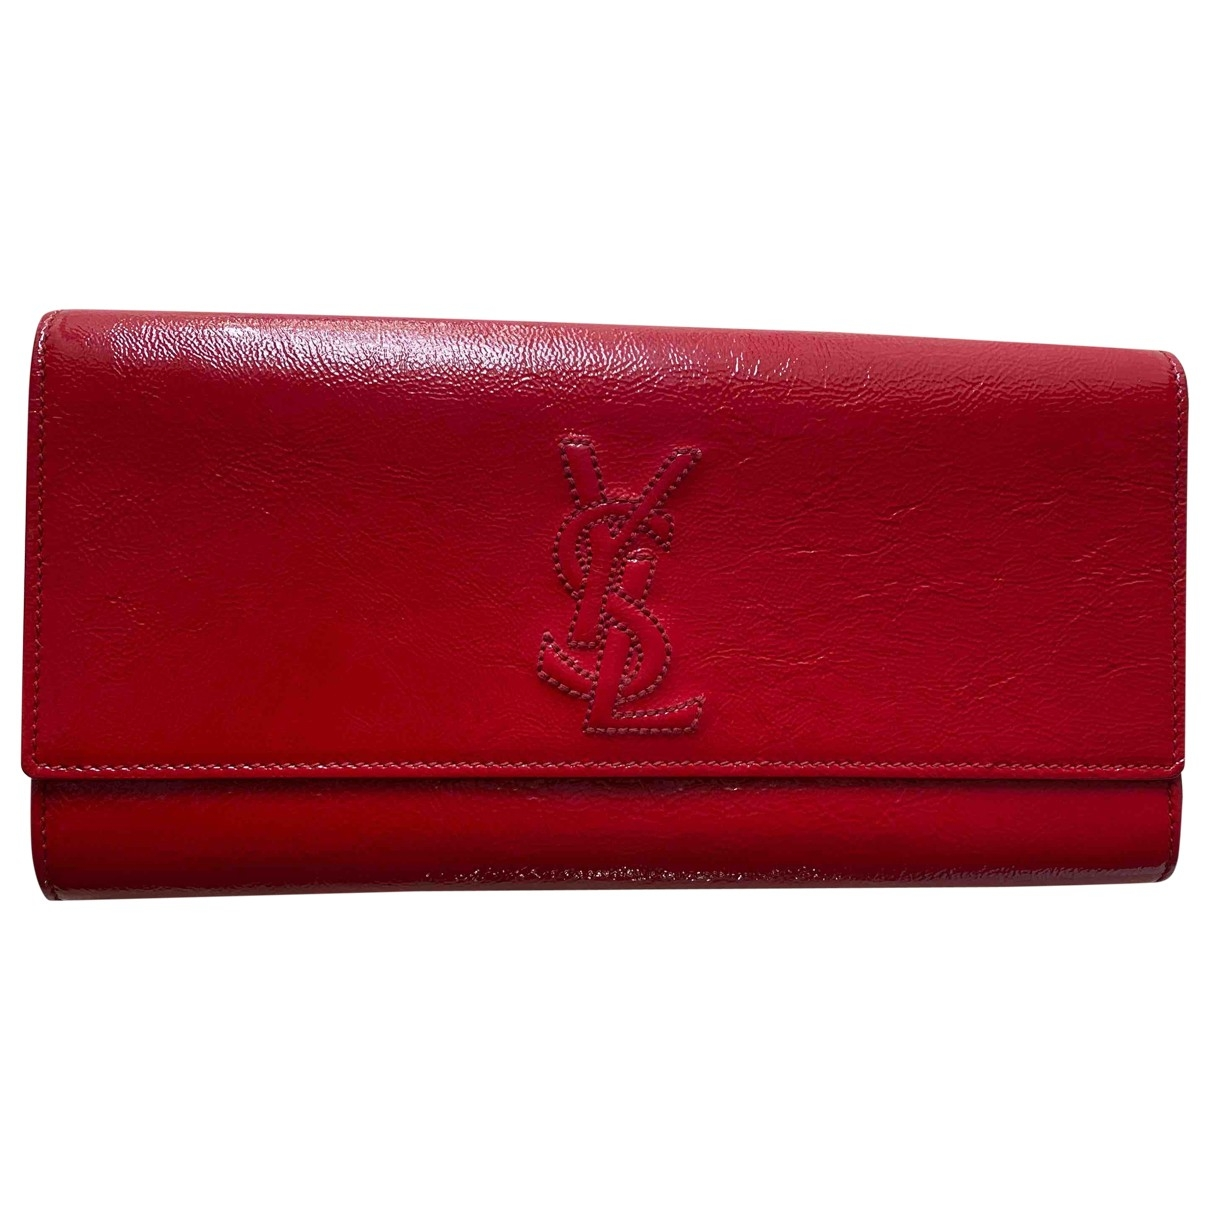 Yves Saint Laurent \N Clutch in  Rot Lackleder